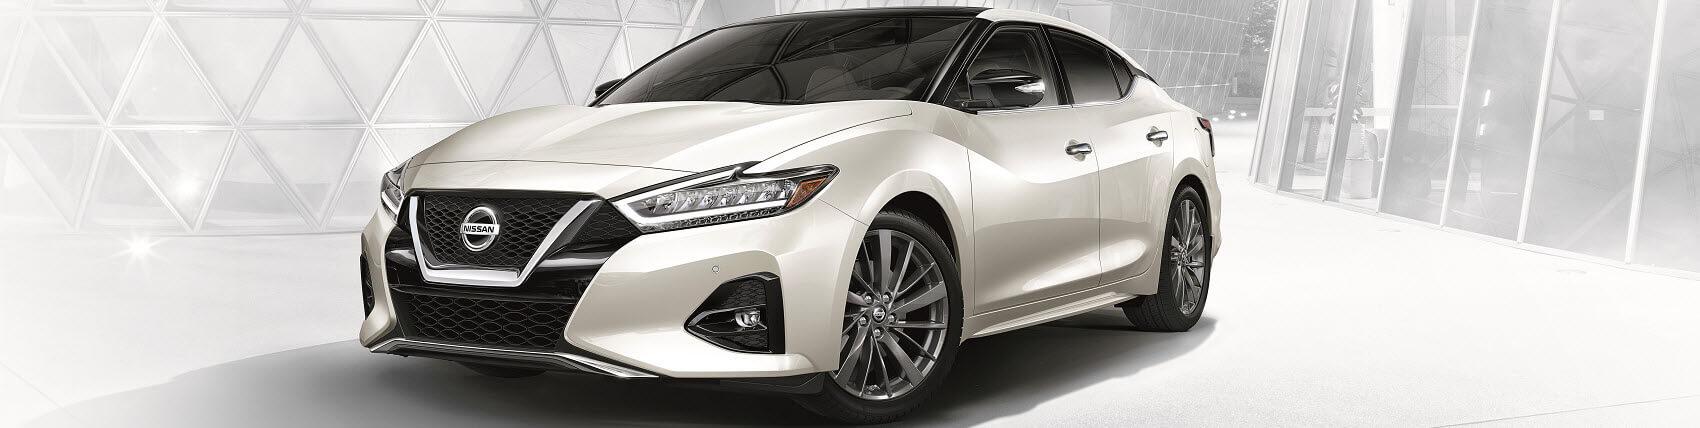 2020 Nissan Maxima White